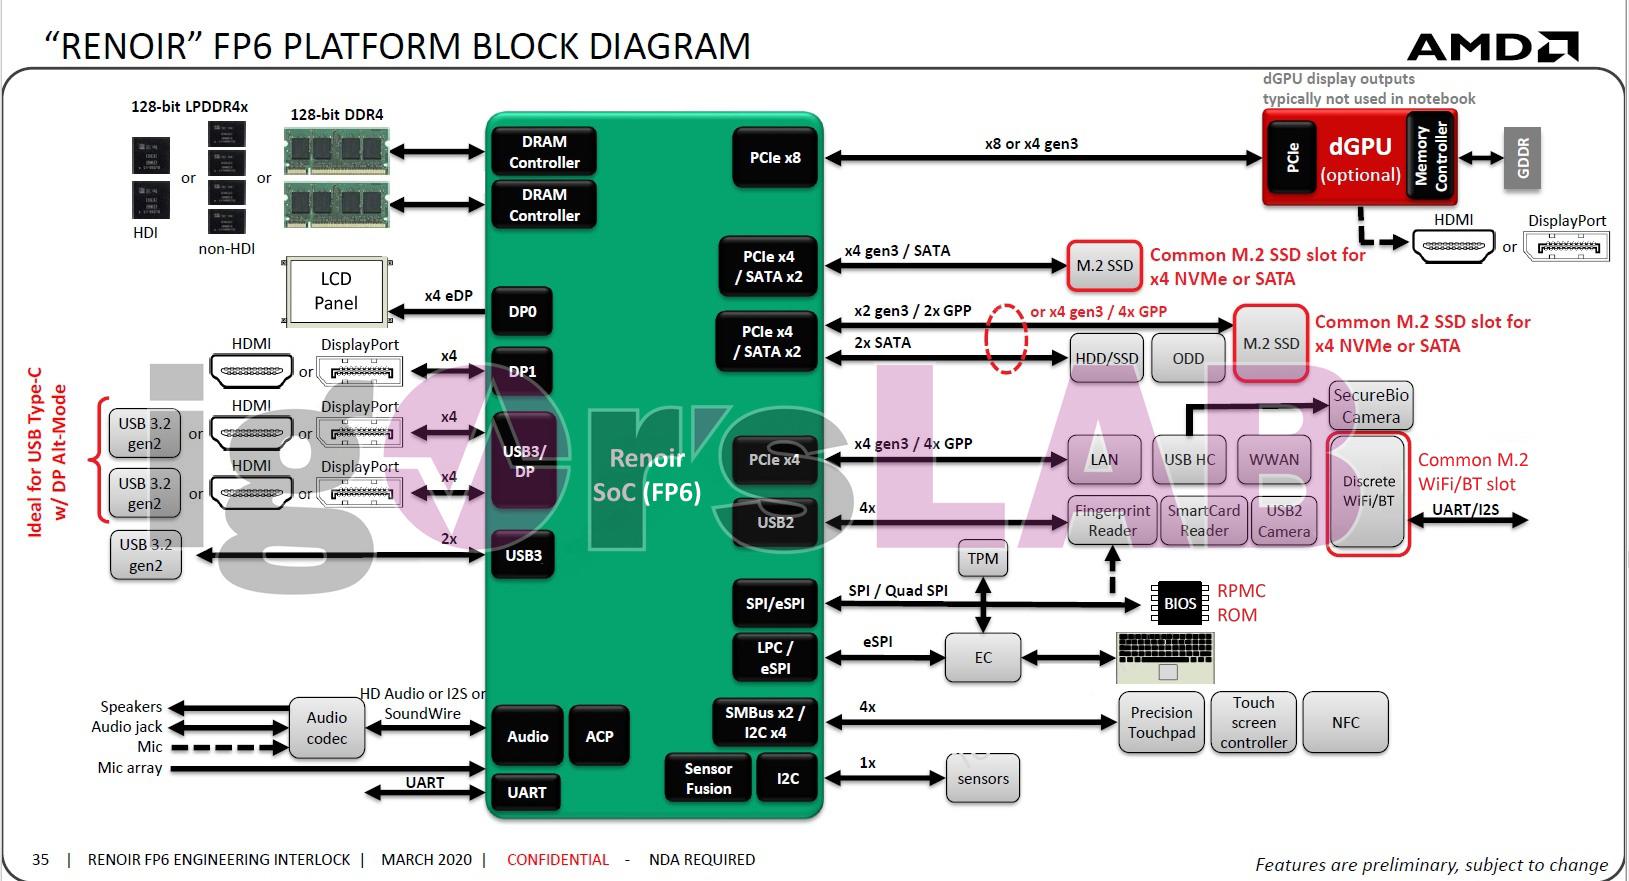 AMD Ryzen Mobile 4000 Discrete Graphics Limited to PCIe Gen3 x8 - Processors 2